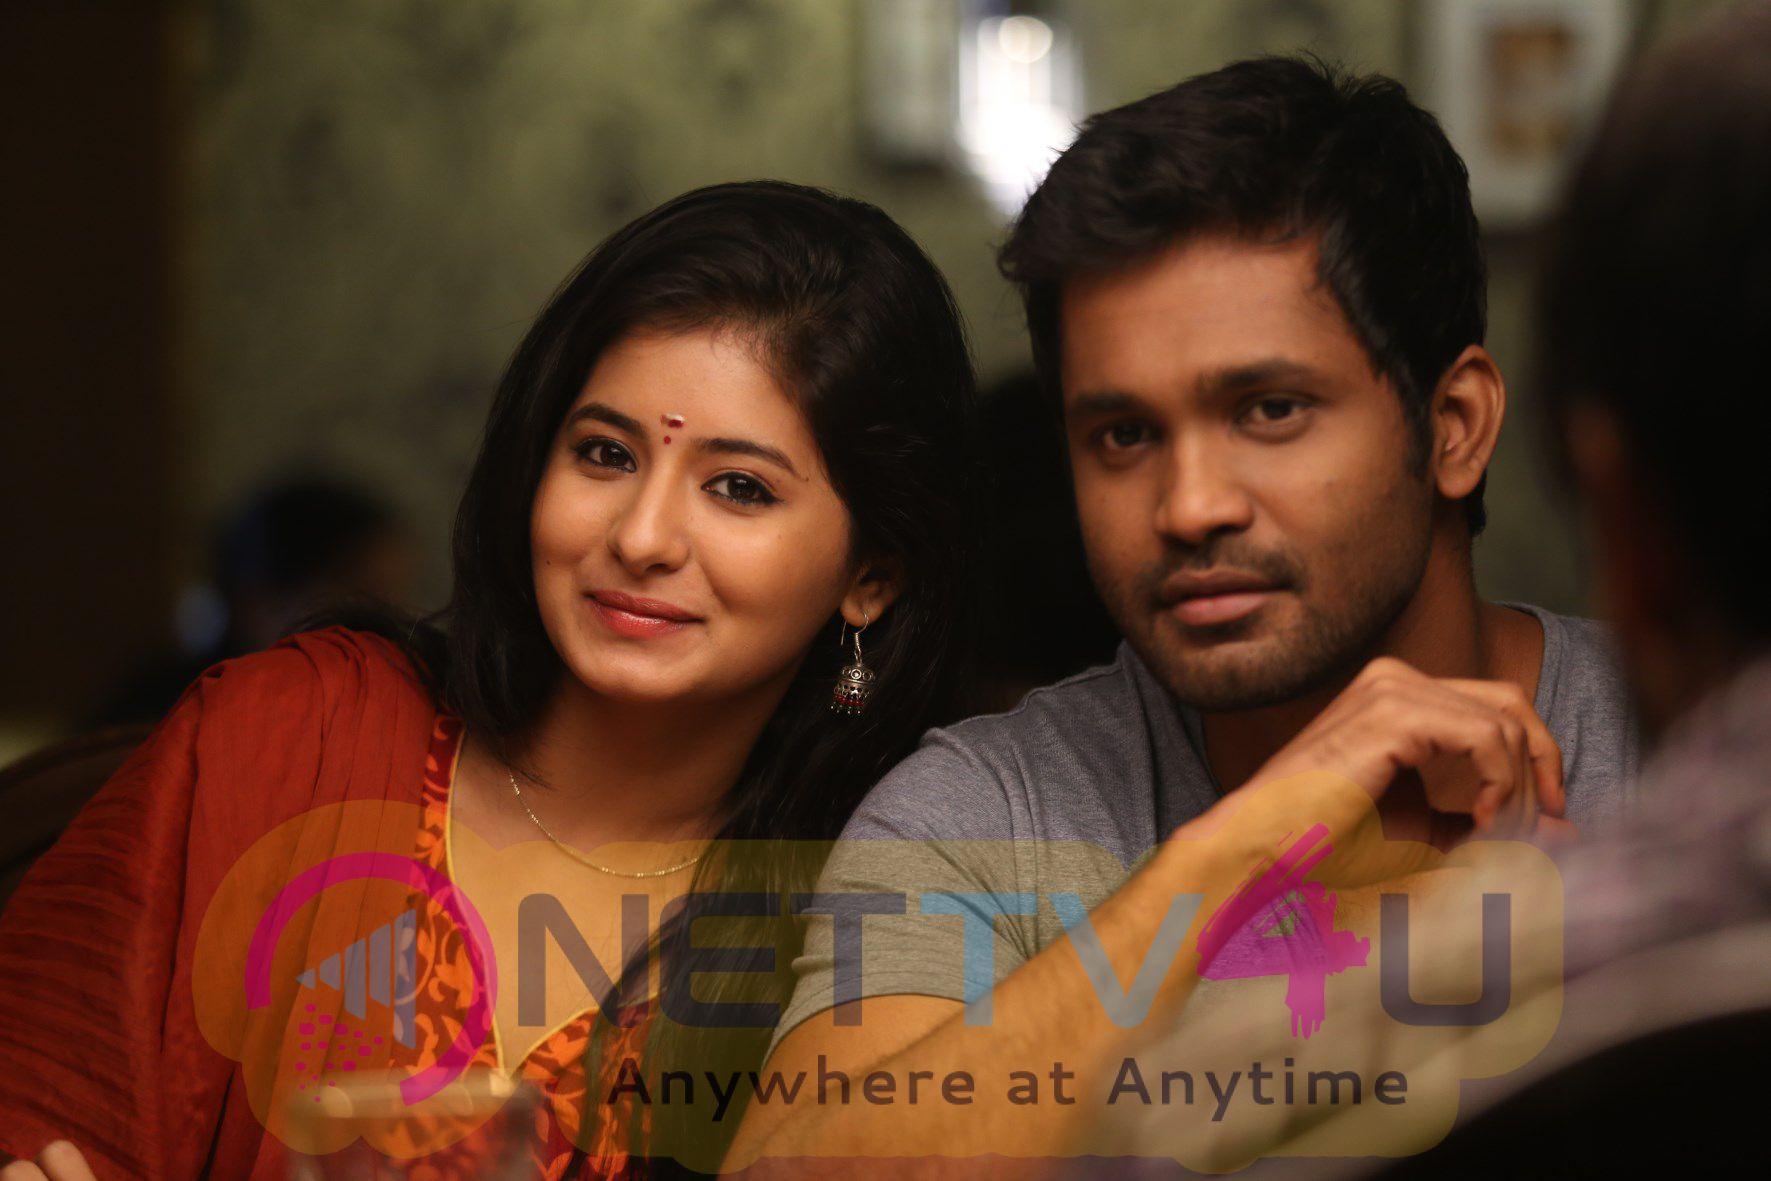 Natppathugaram Movie Stills & Latest Images